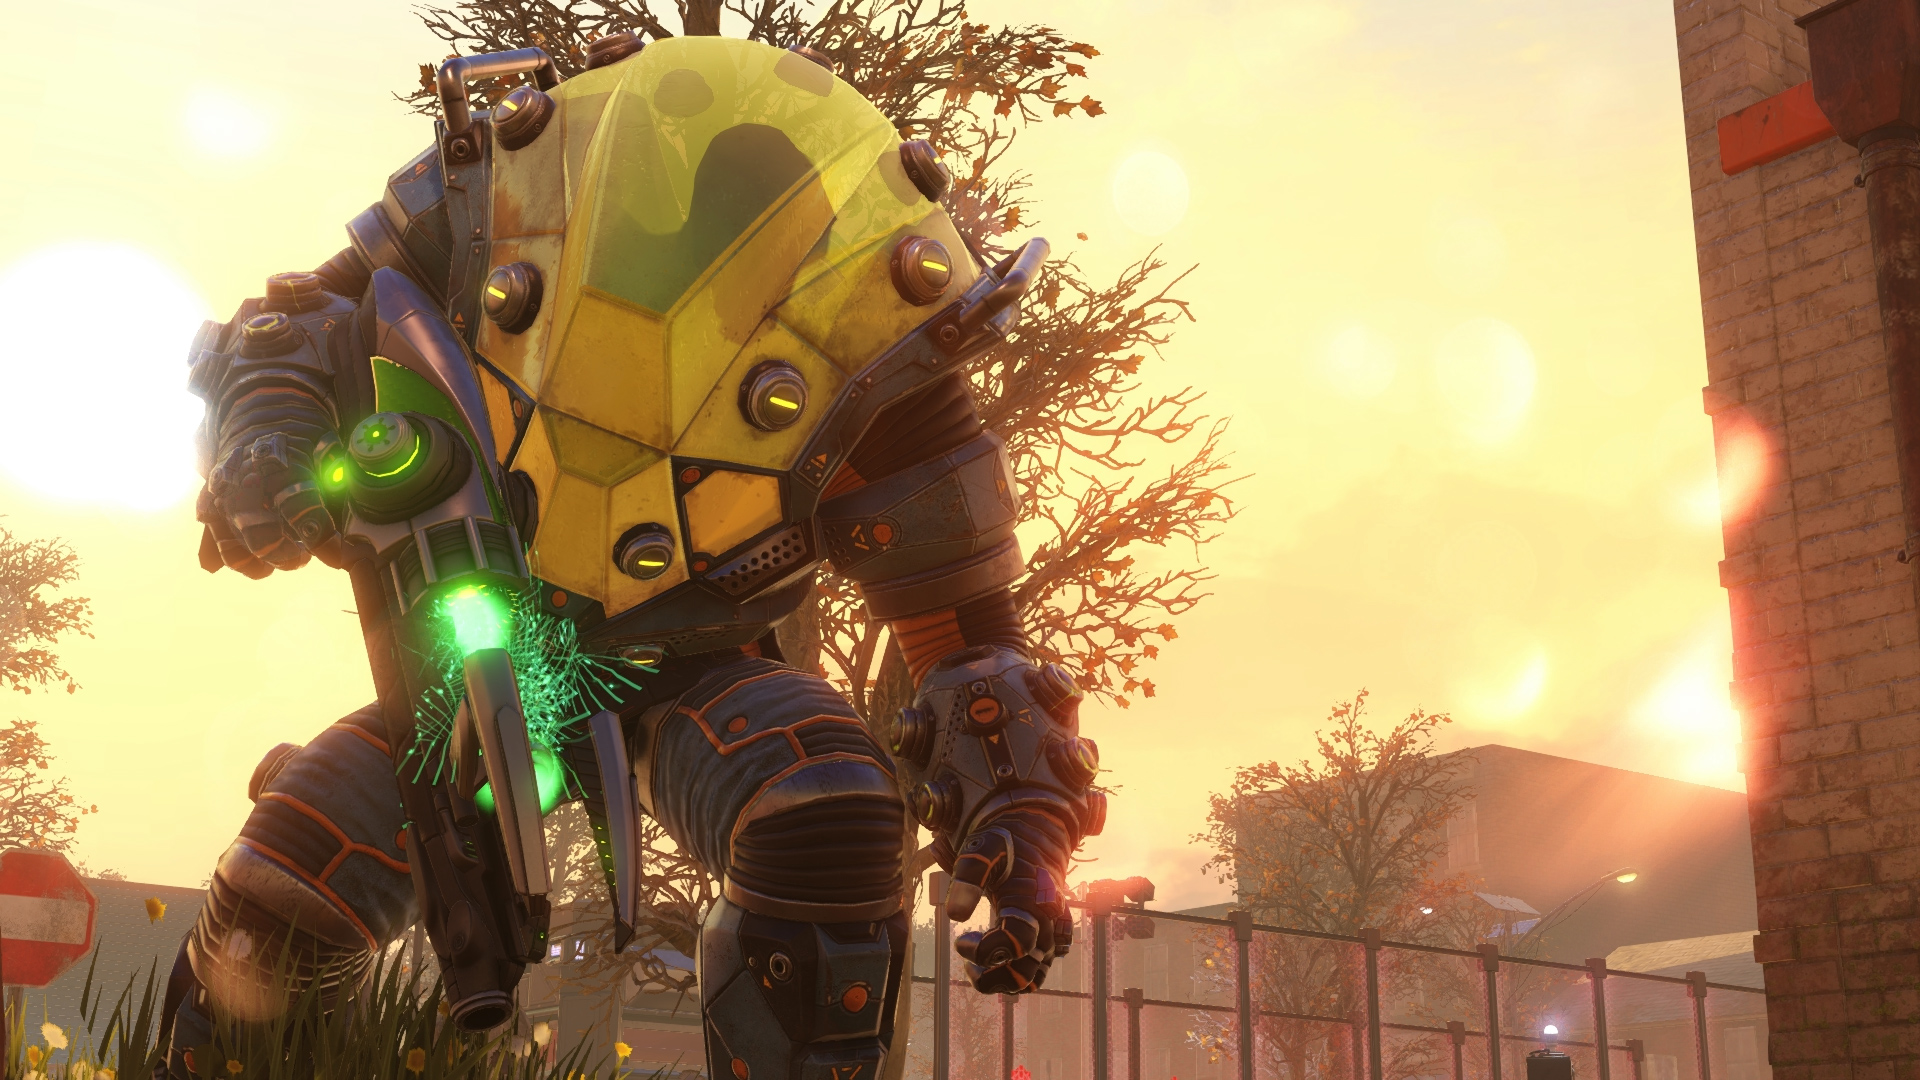 XCOM 2 Preorder Bonuses Revealed